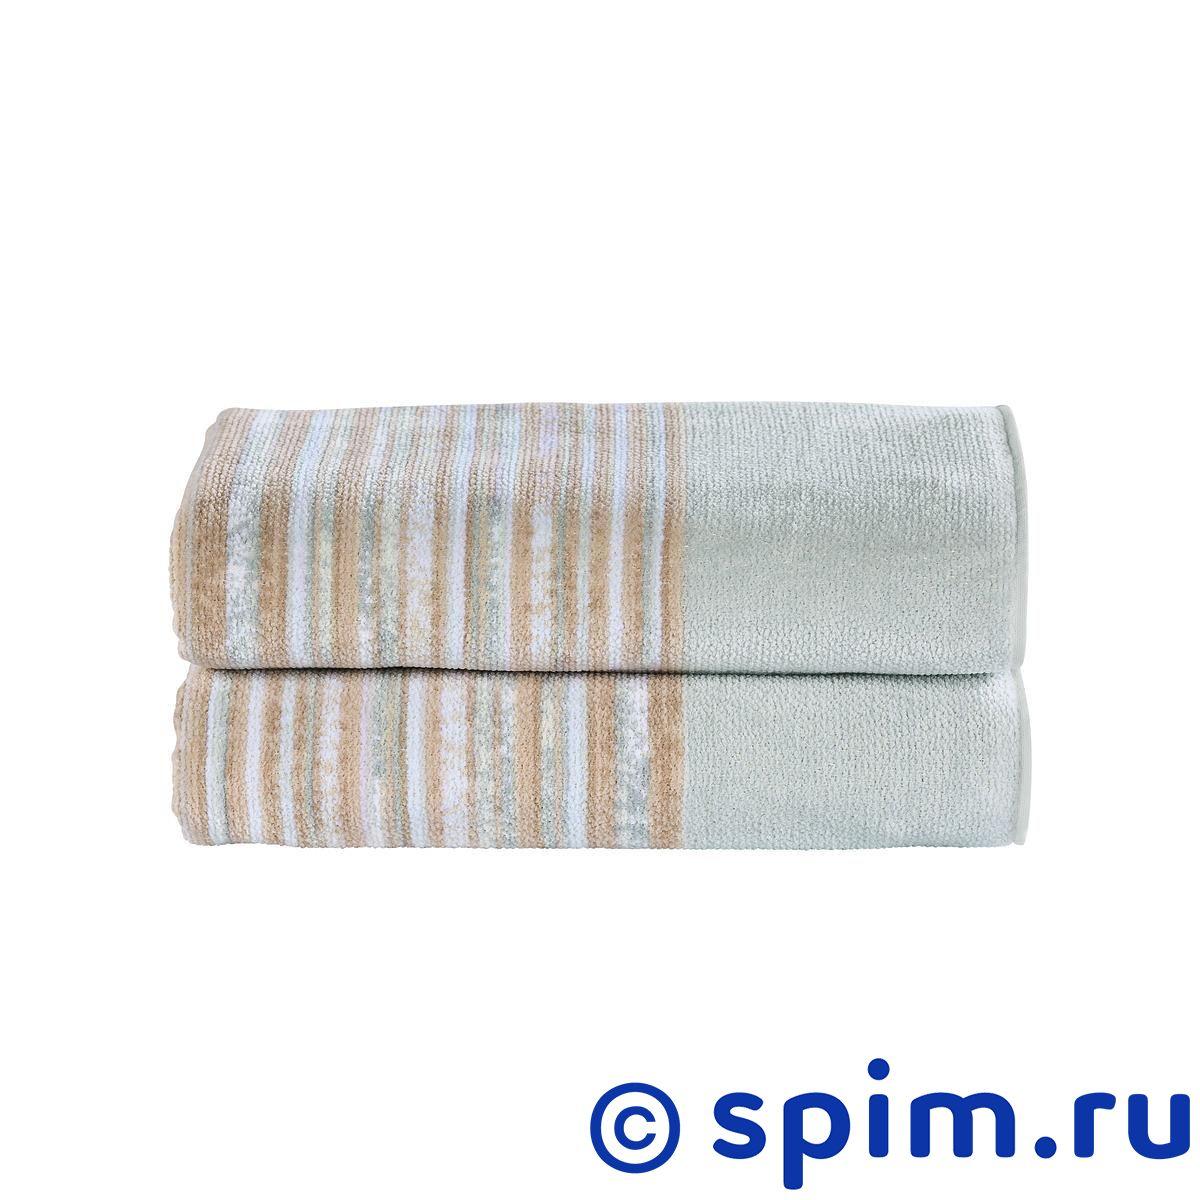 Полотенце Feiler Horizon 50х100 см полотенце feiler dogs 50х100 см